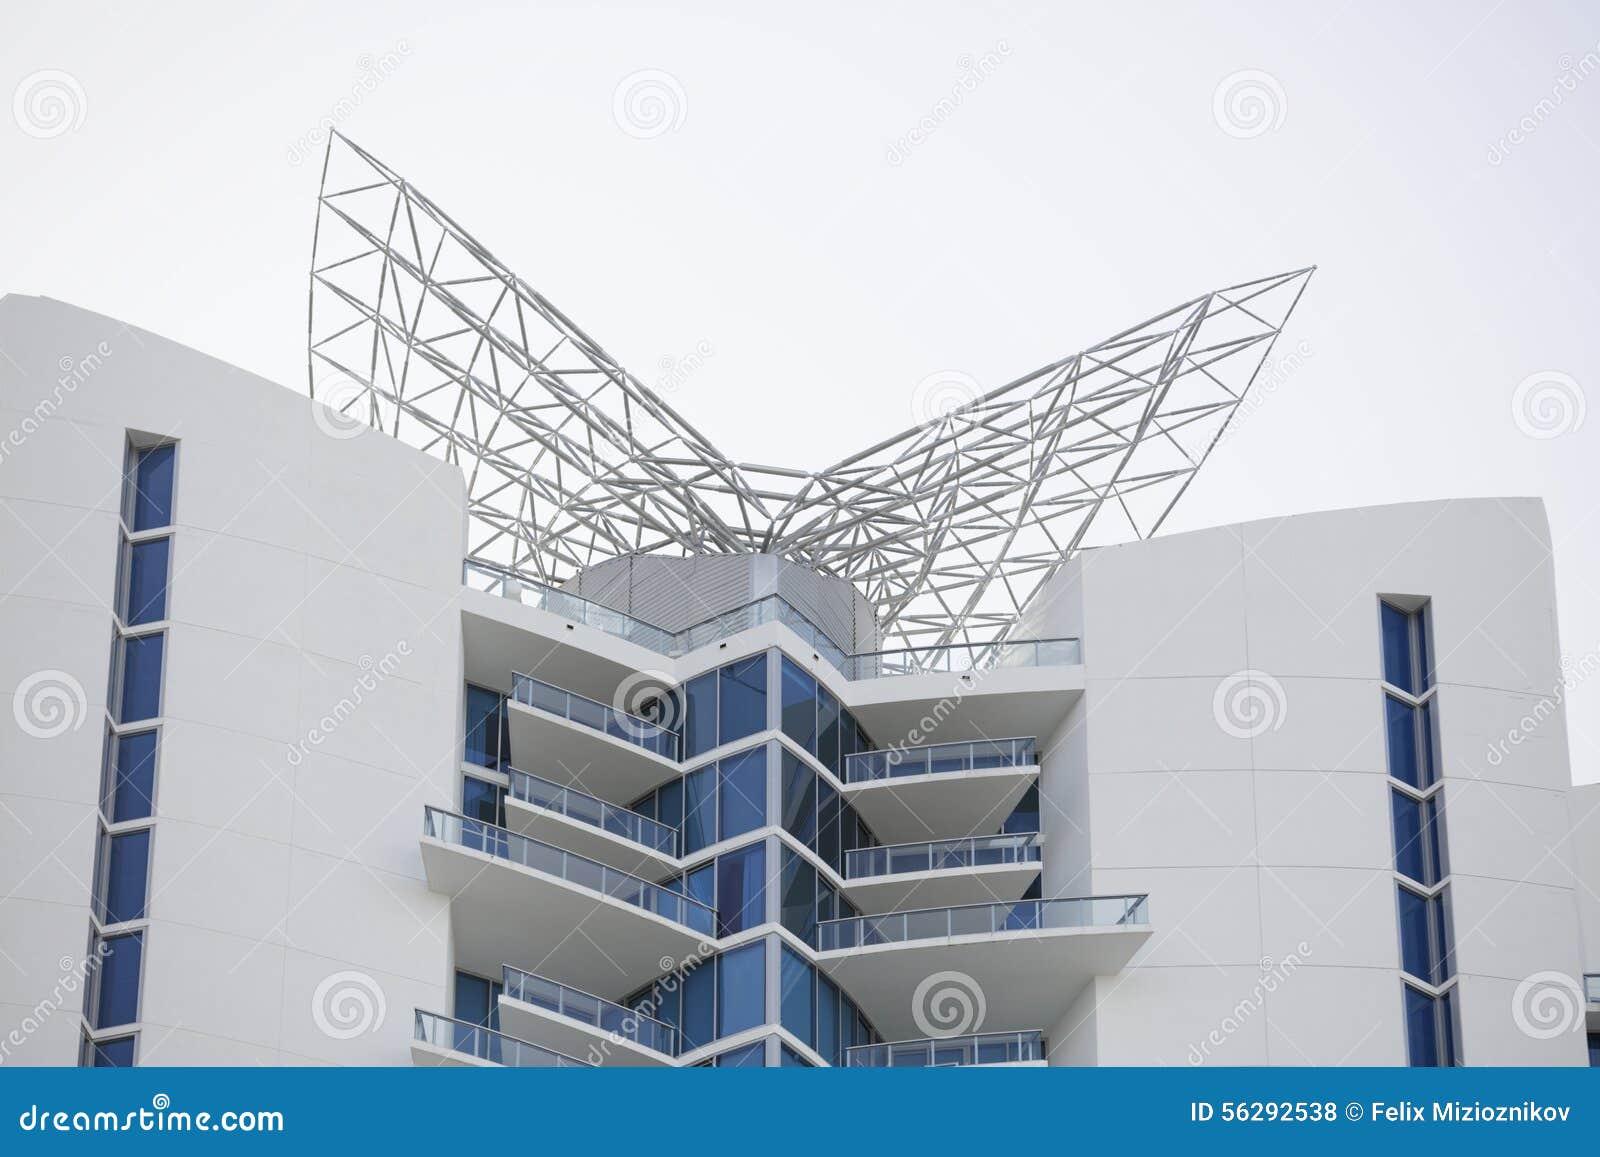 Modern architecture structure stock photo image 56292538 for Structure in architecture the building of buildings